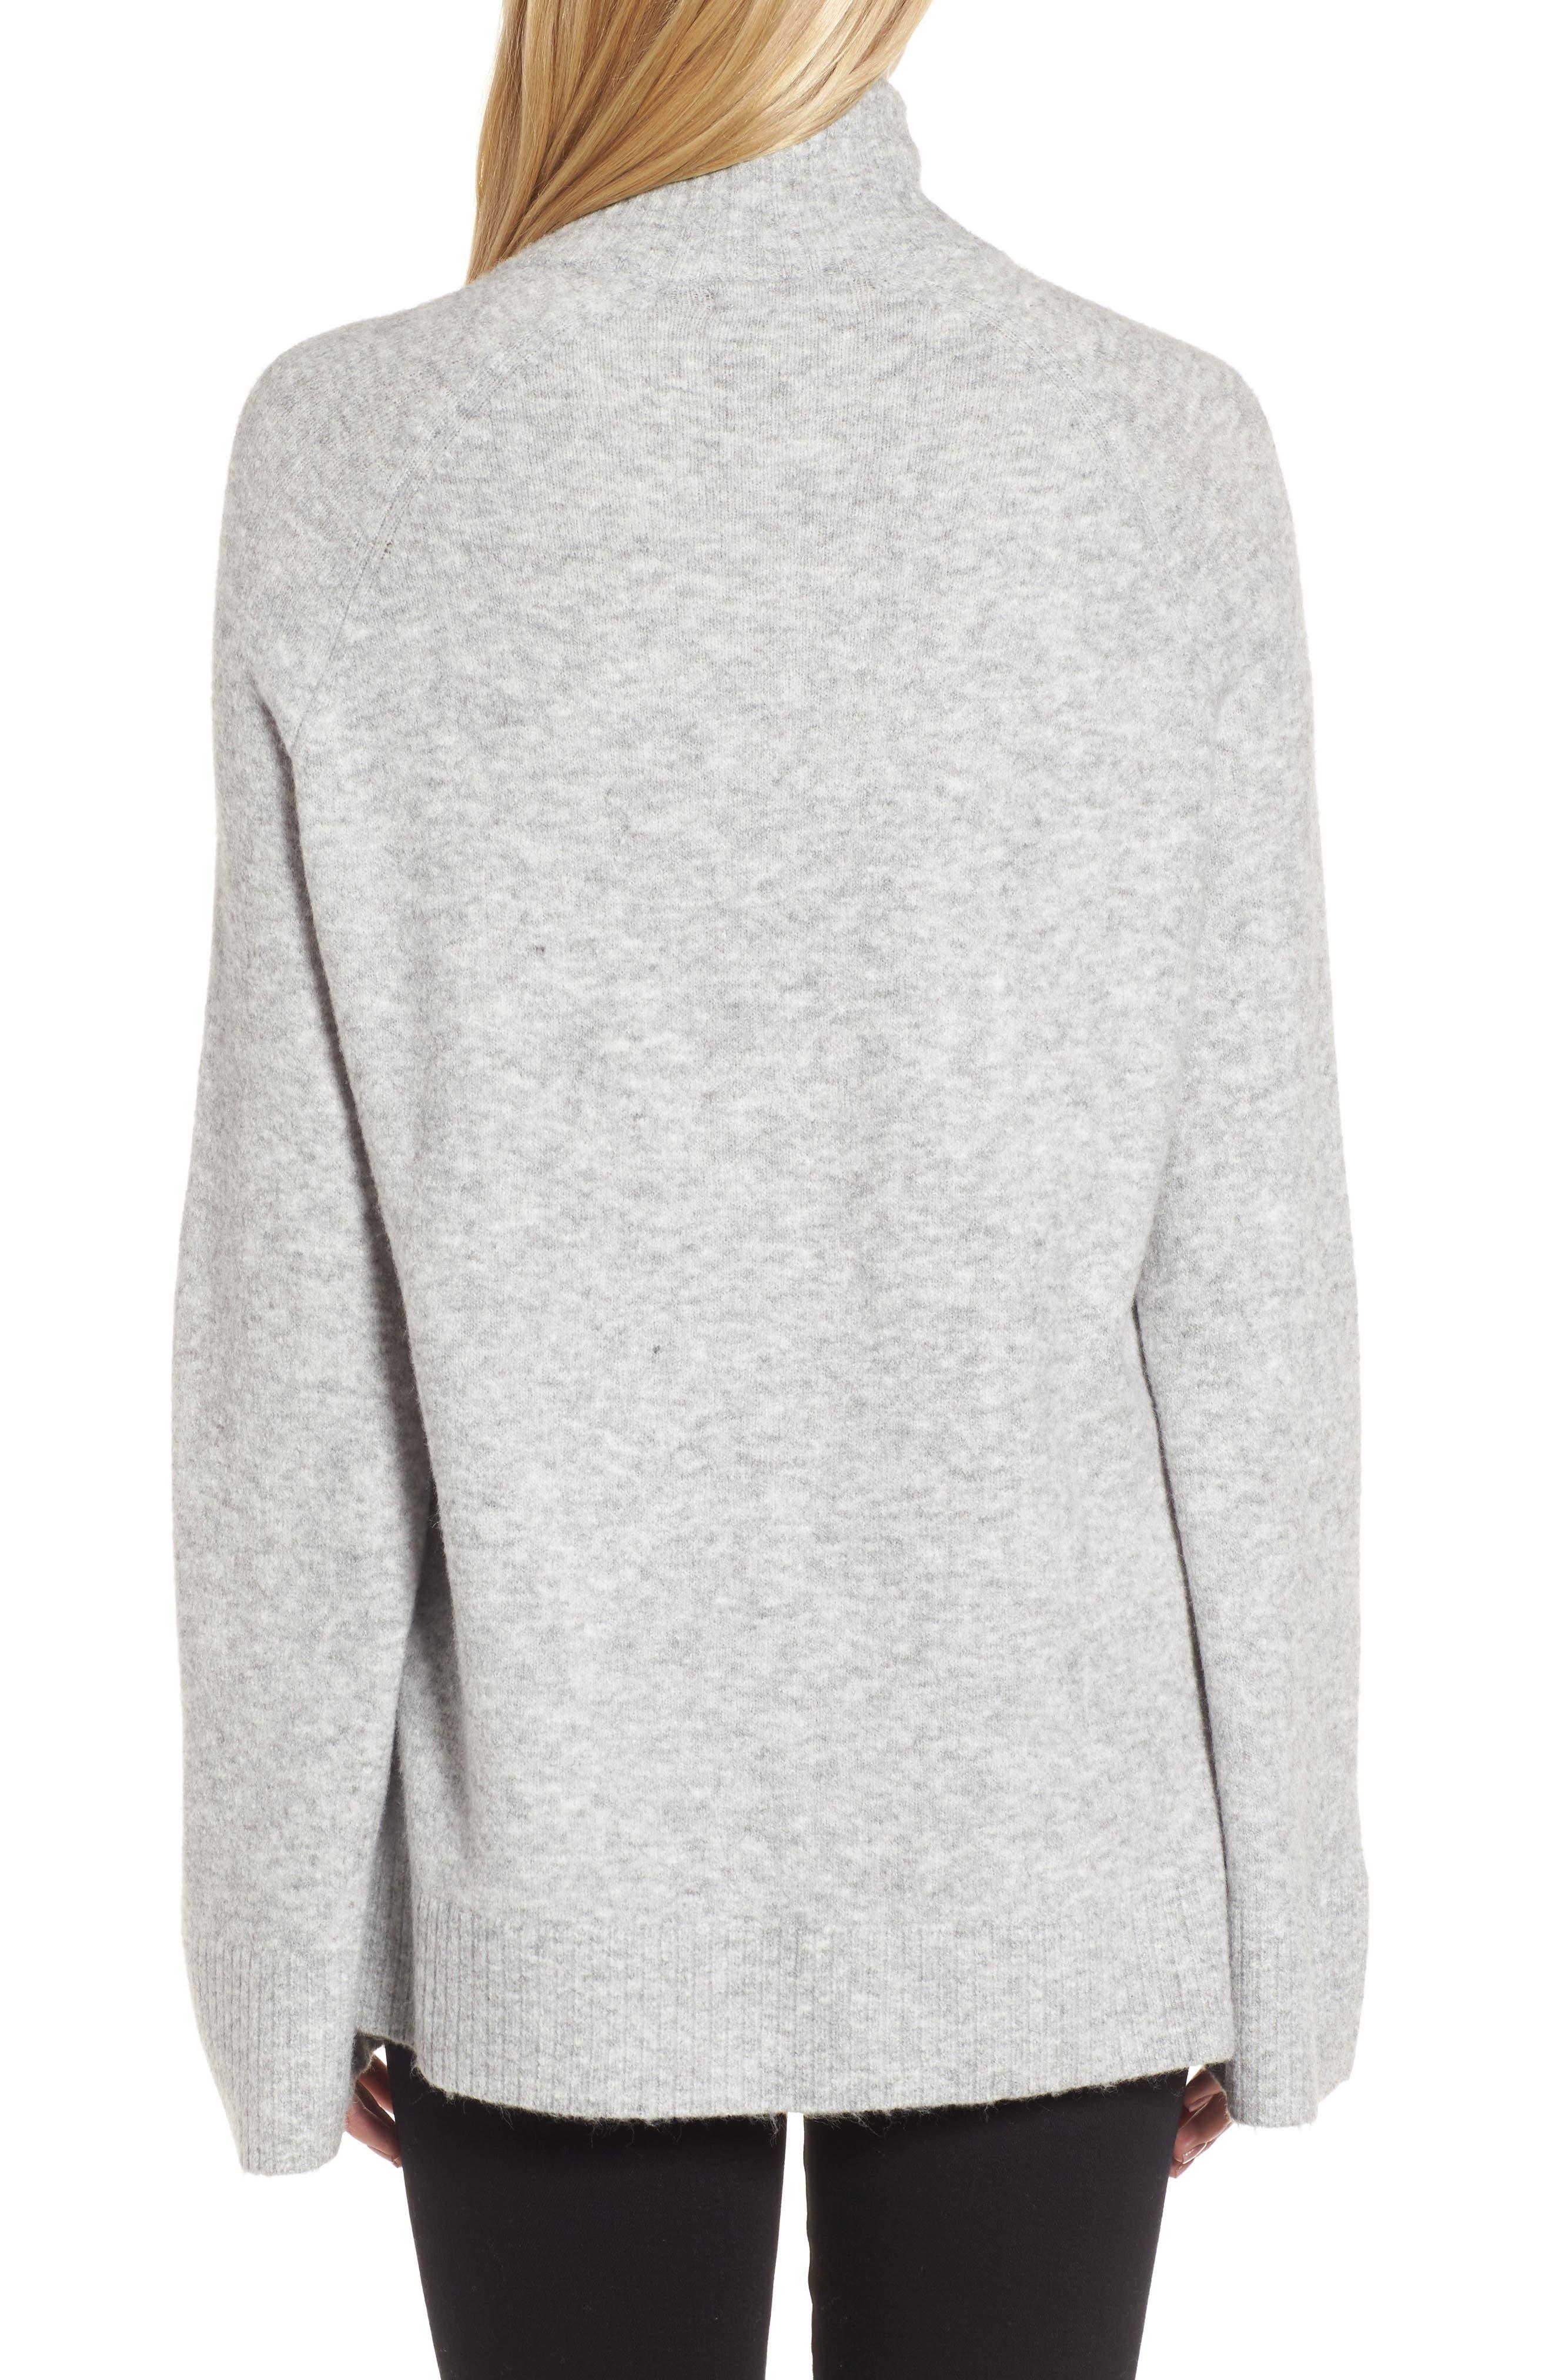 Half Zip Pullover,                             Alternate thumbnail 2, color,                             Grey Heather